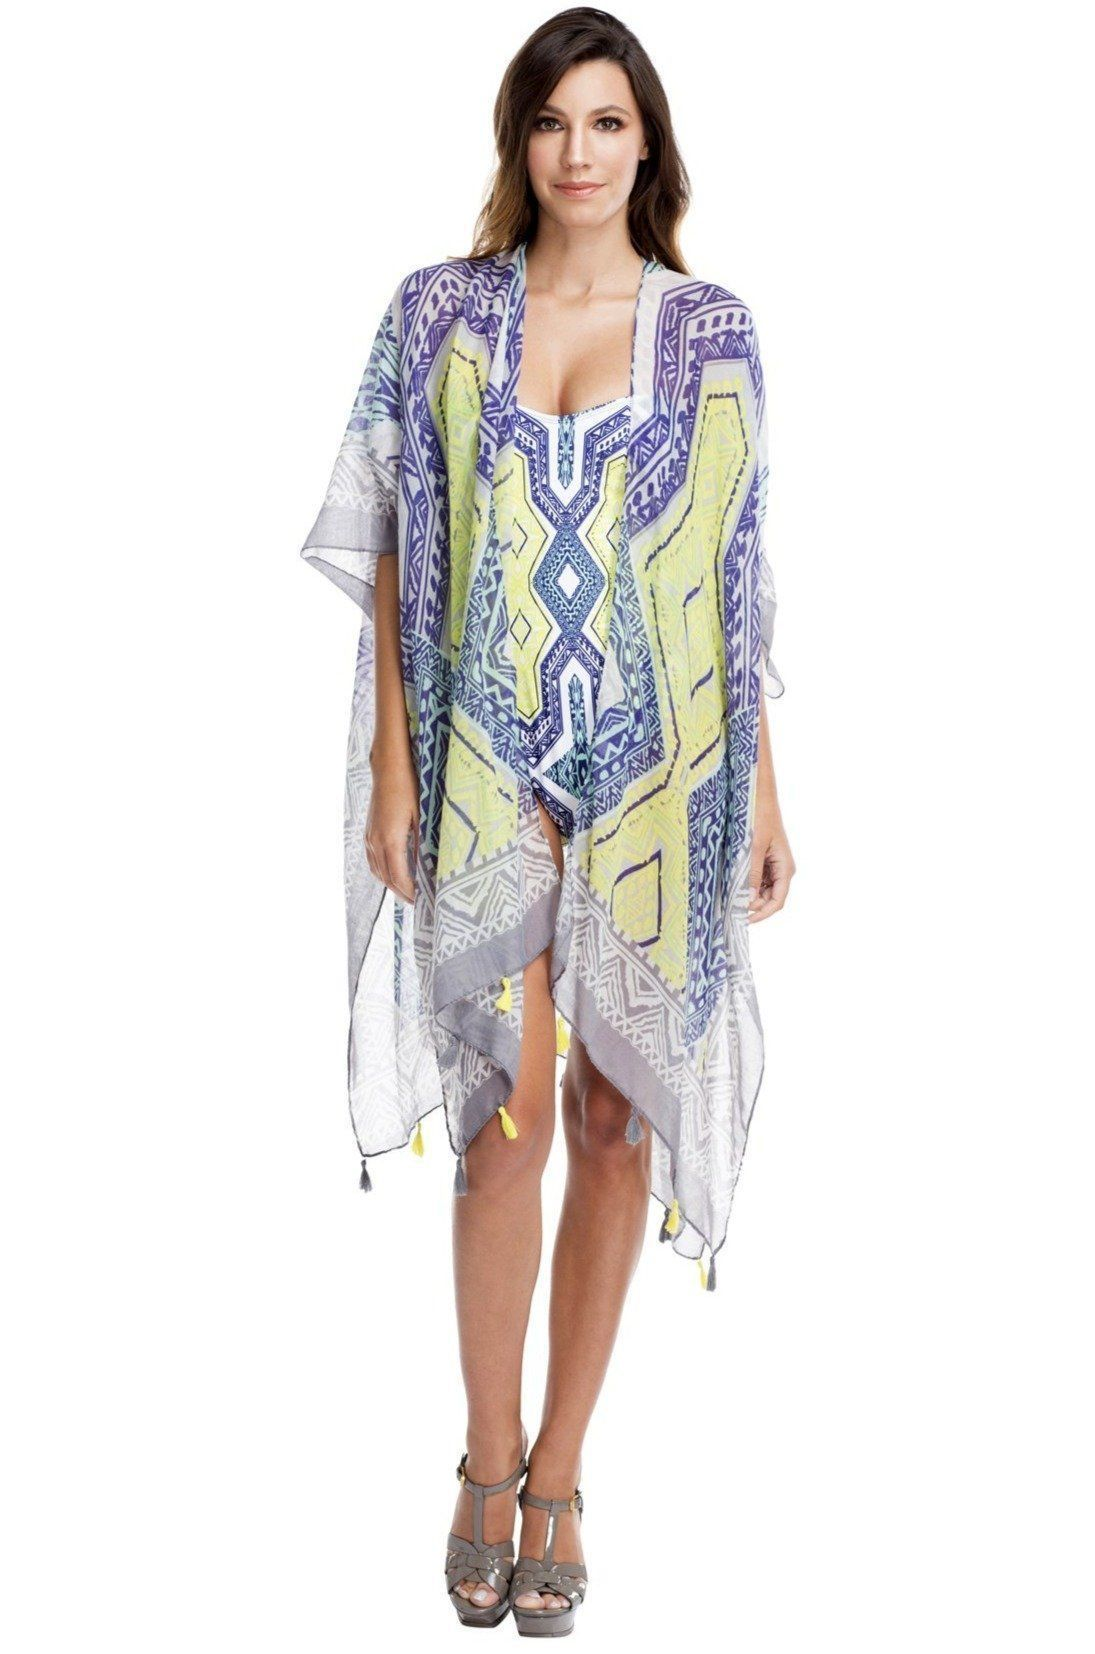 Swim wear & Beachwear Kimonos   Beach & Swimsuit Cover-Ups